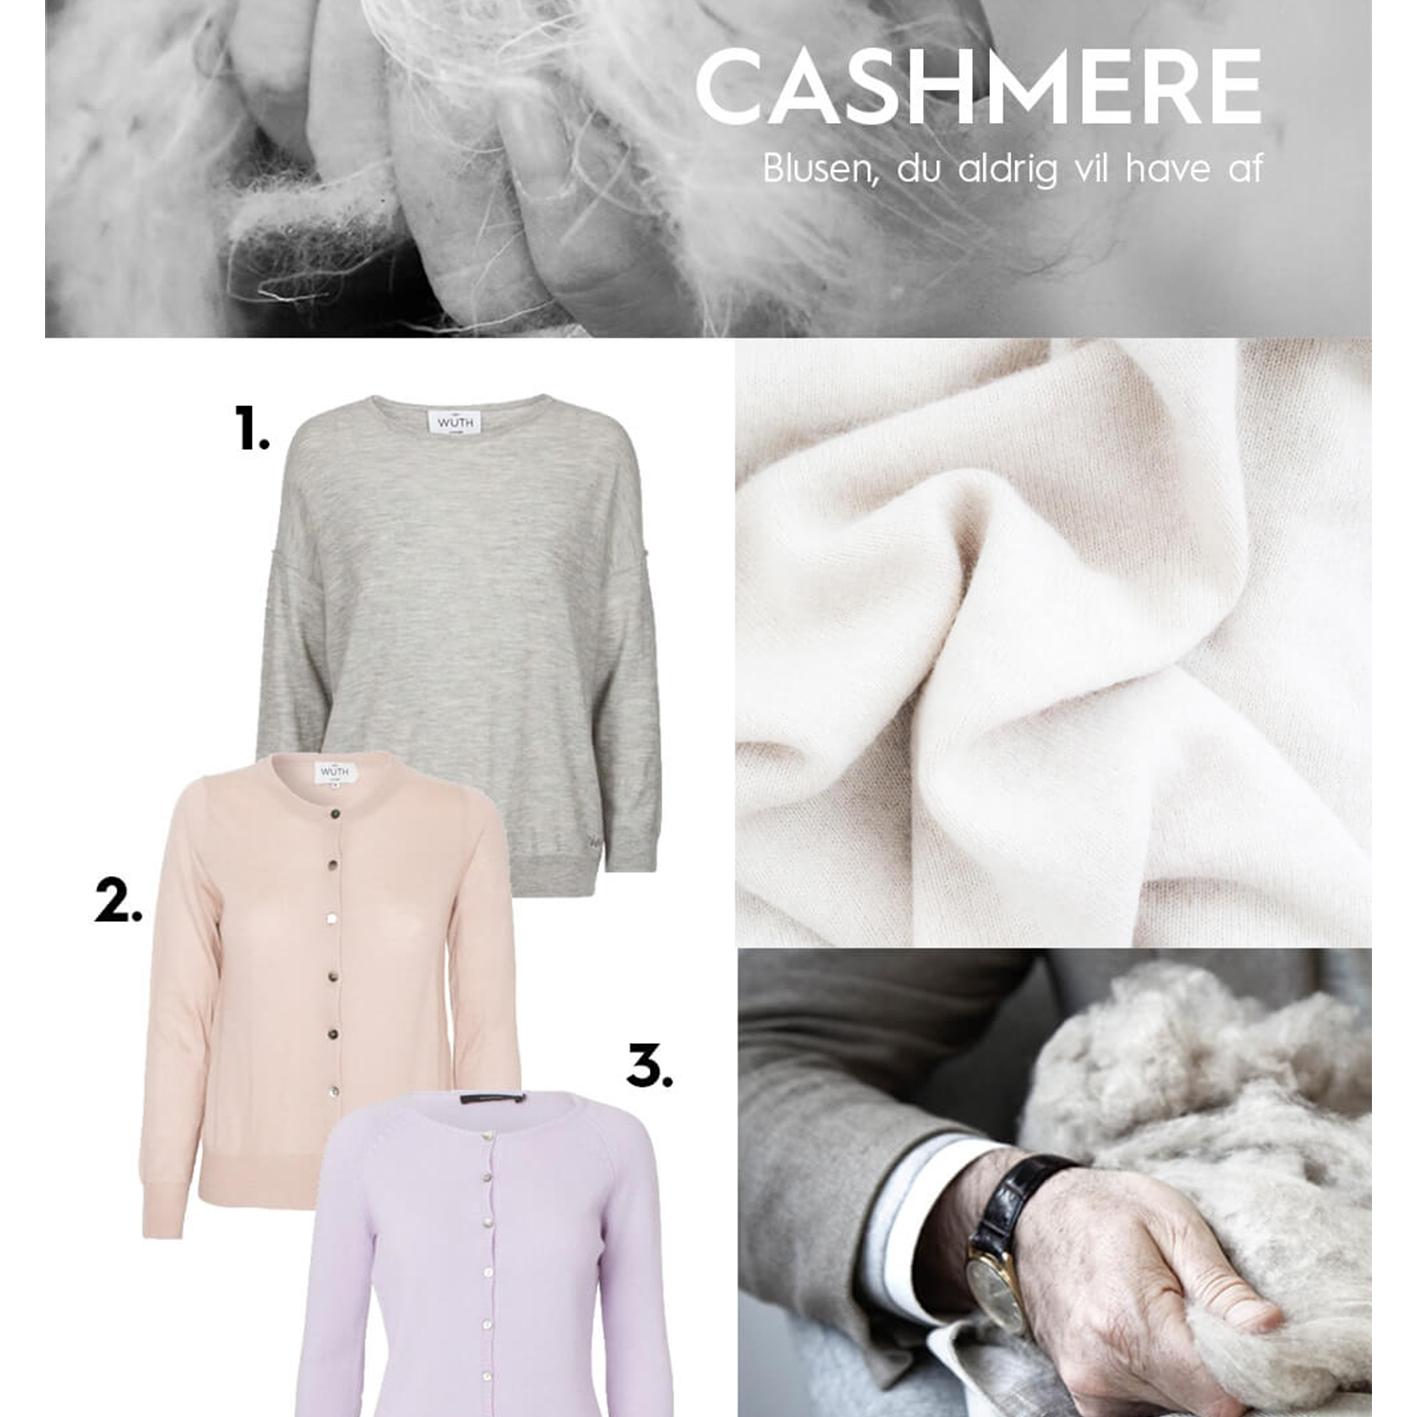 Wuth Cashmere bluse og cardigan i Hausfrau